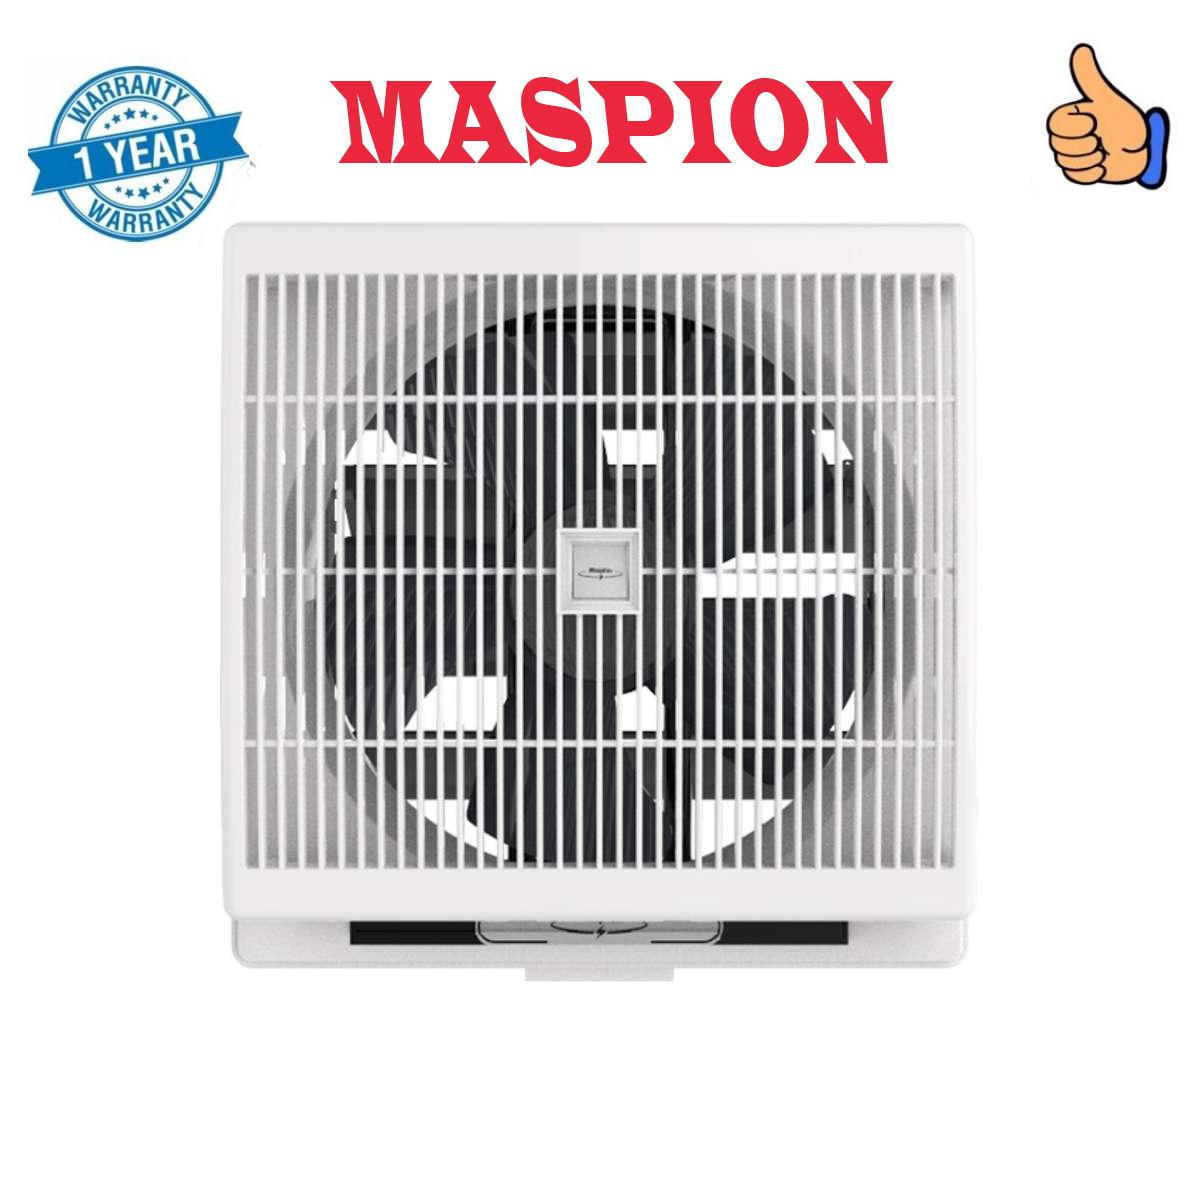 Maspion 12